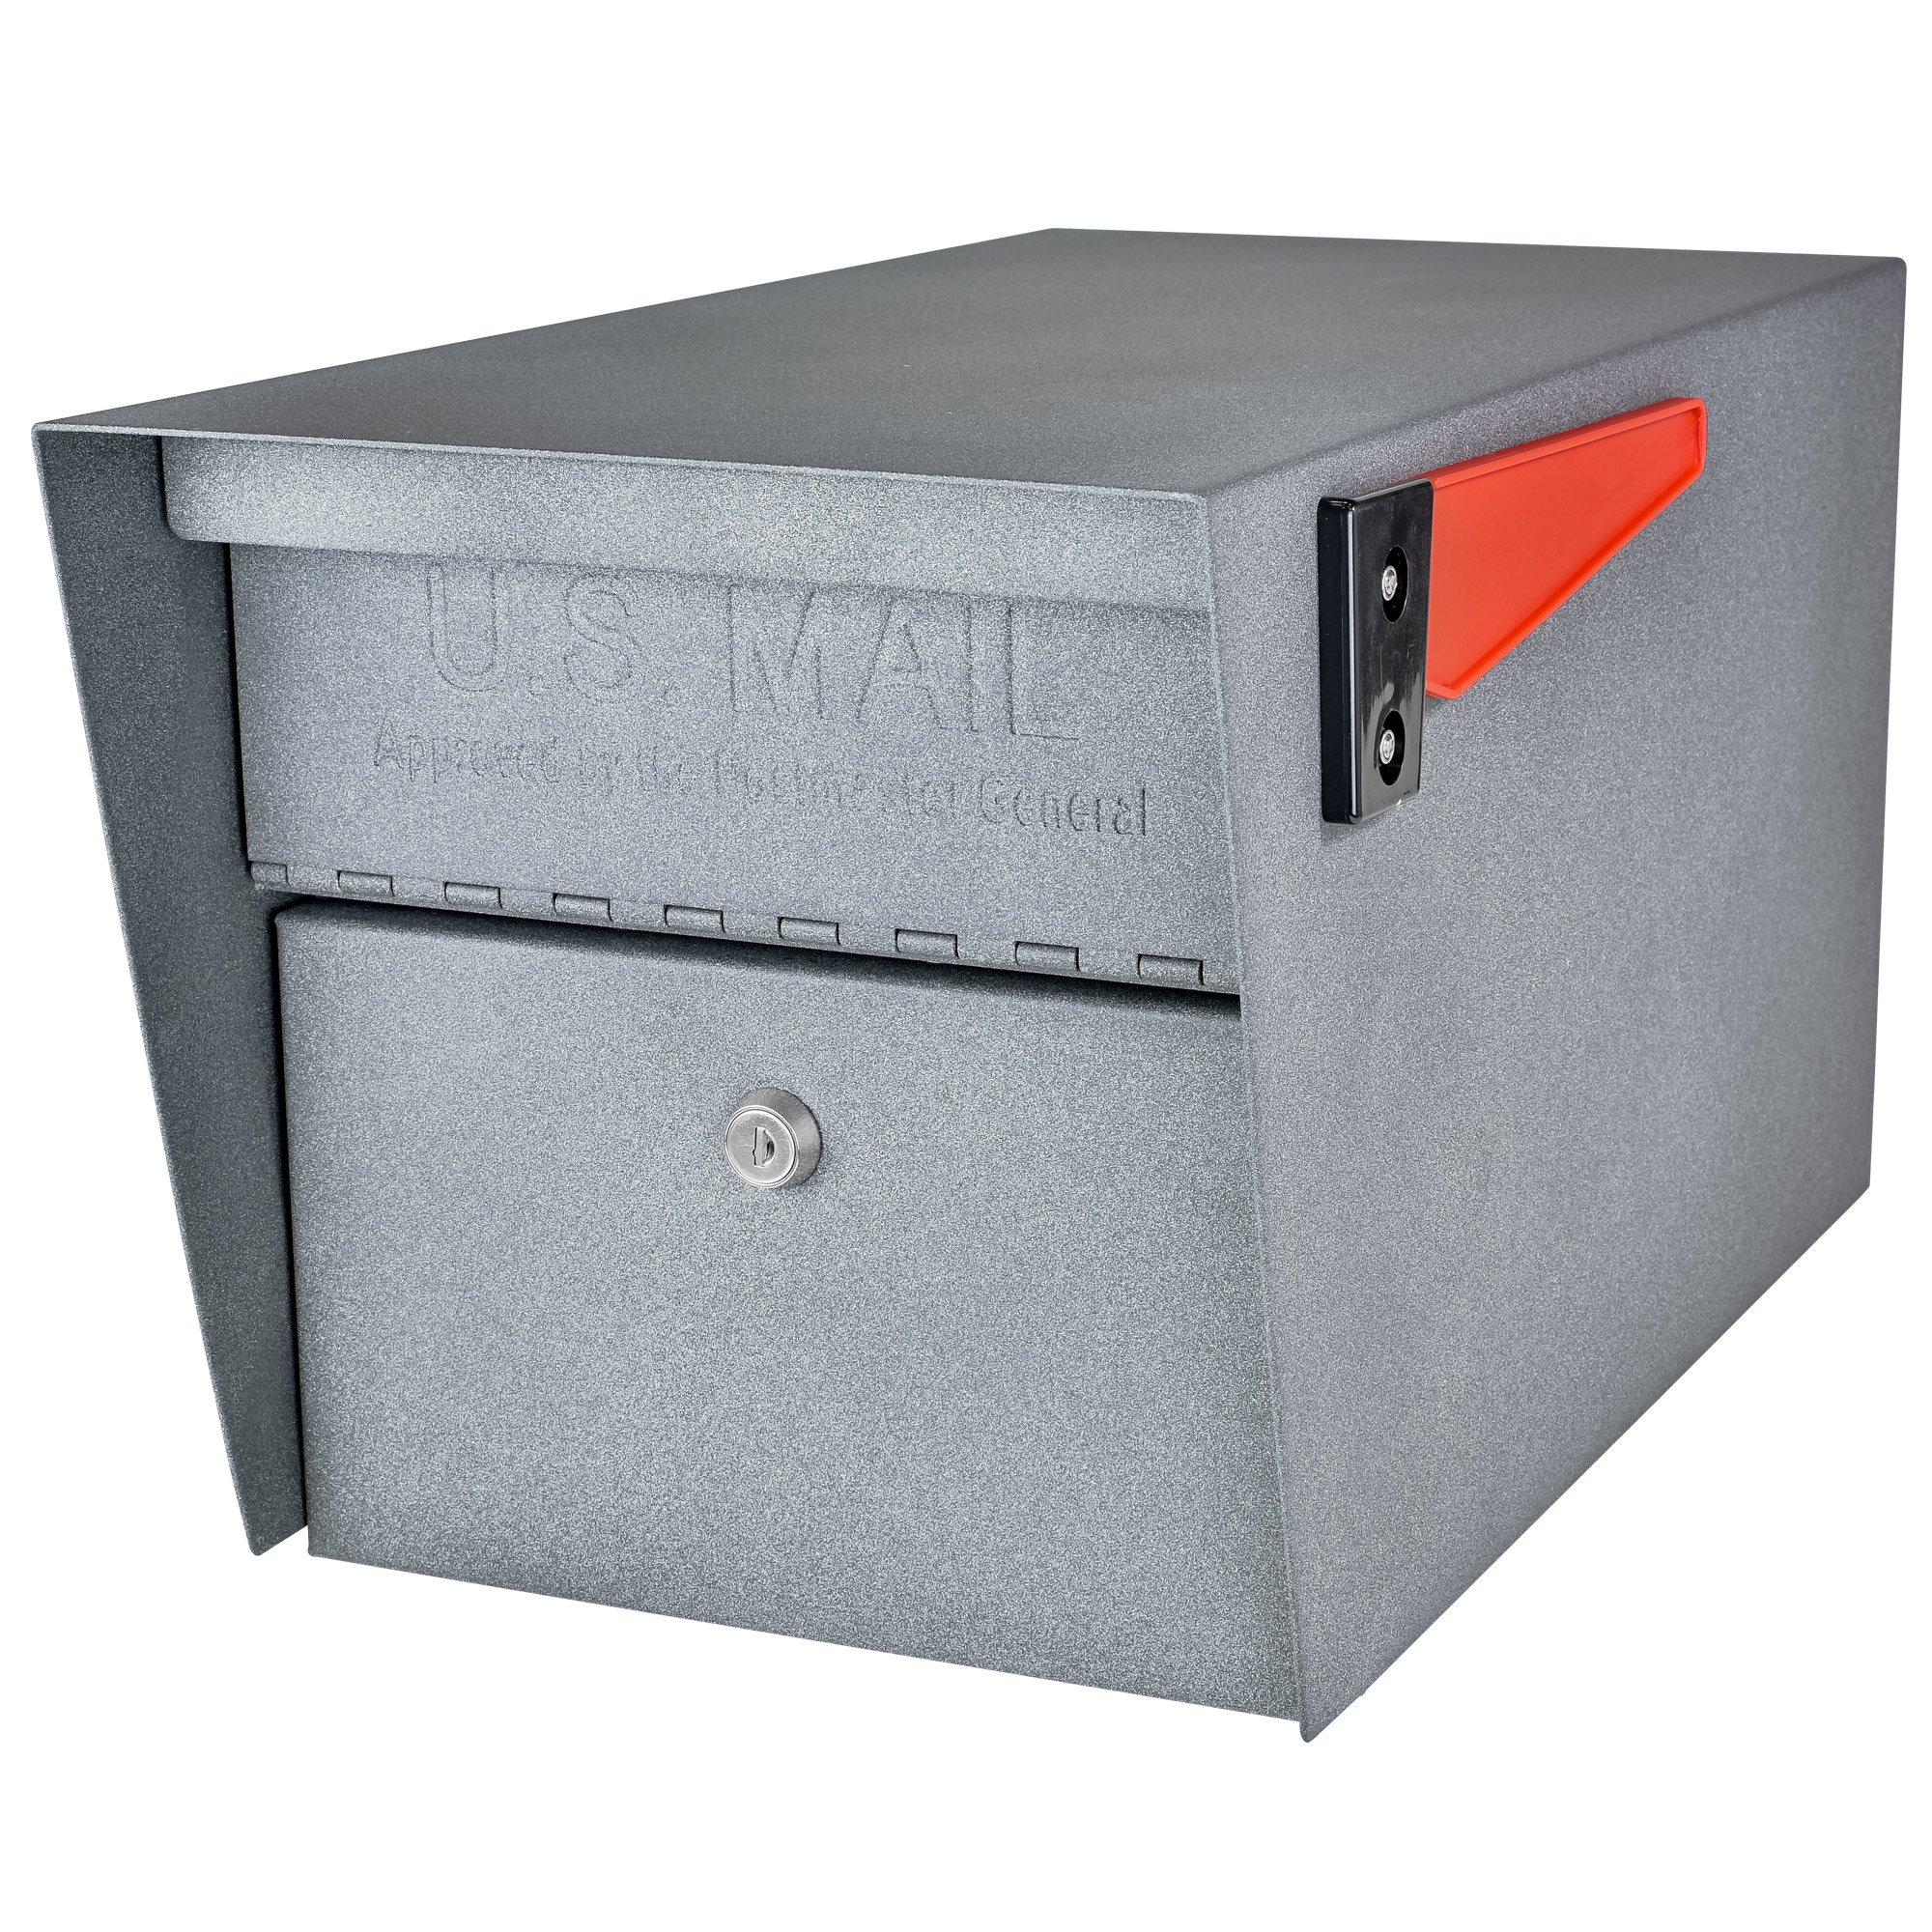 Mail Boss 7505 Mail Manager Locking Security Mailbox, Granite